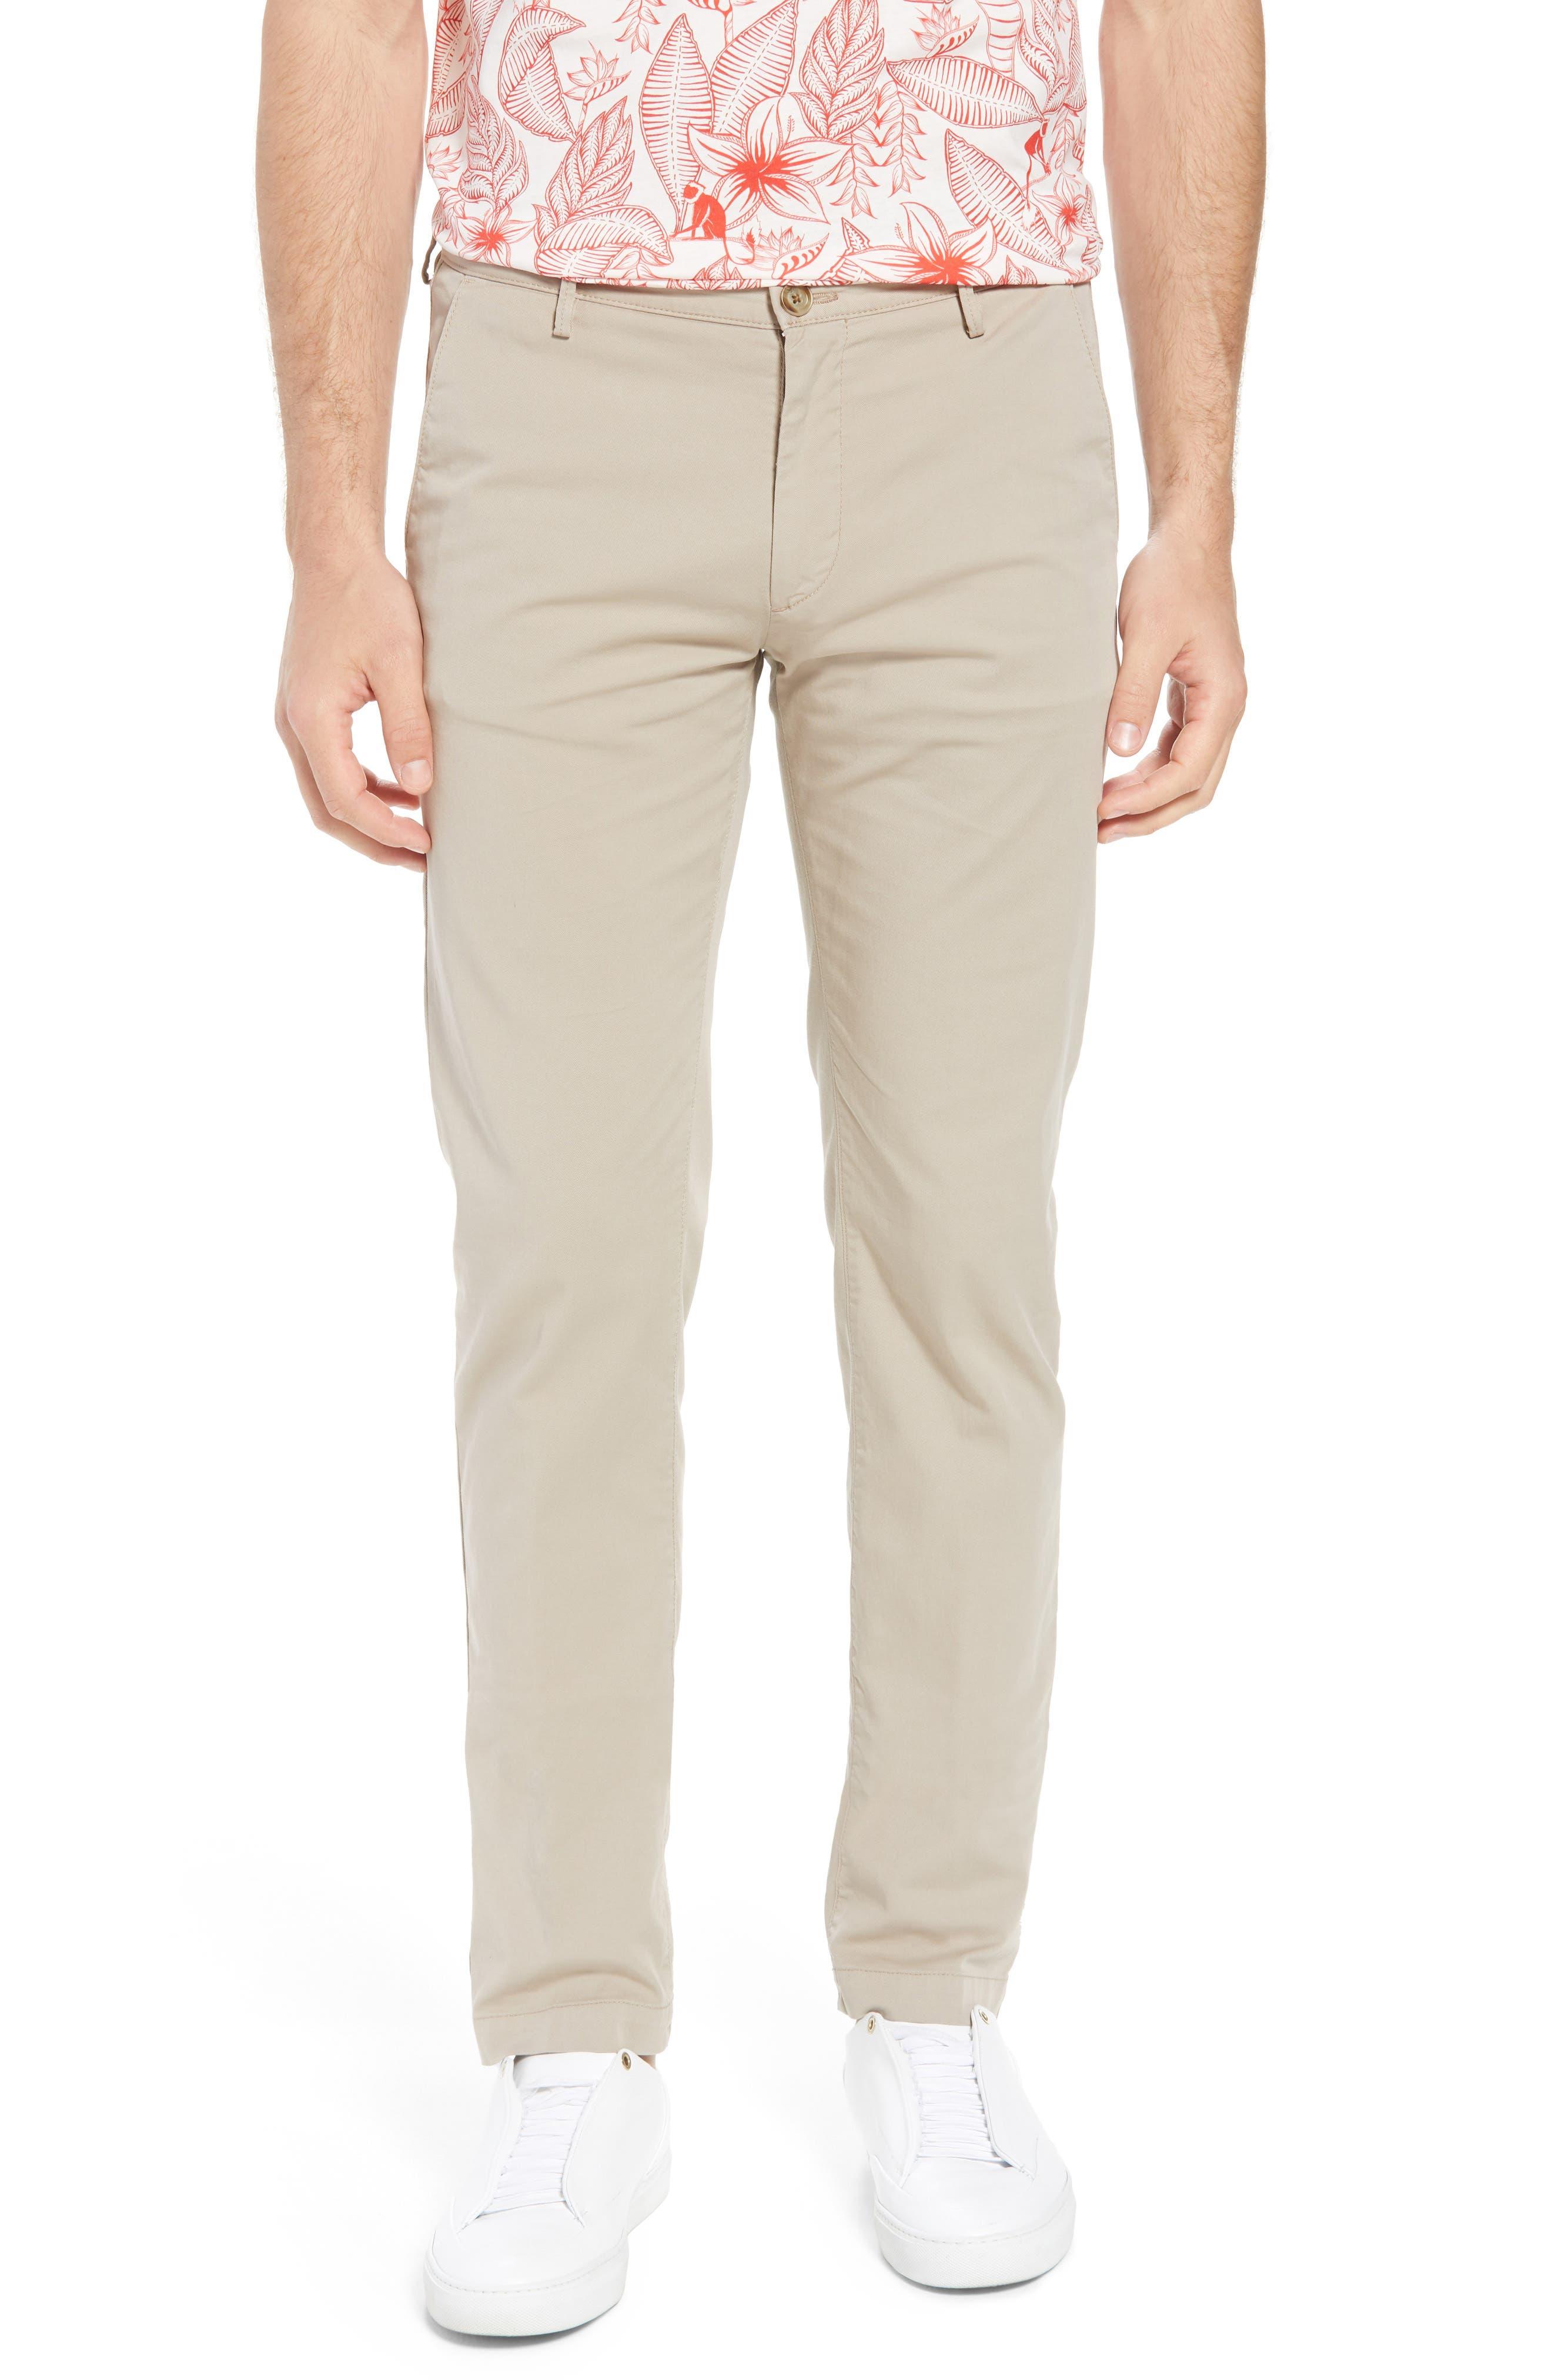 Rice Slim Fit Chino Pants,                         Main,                         color, Brown